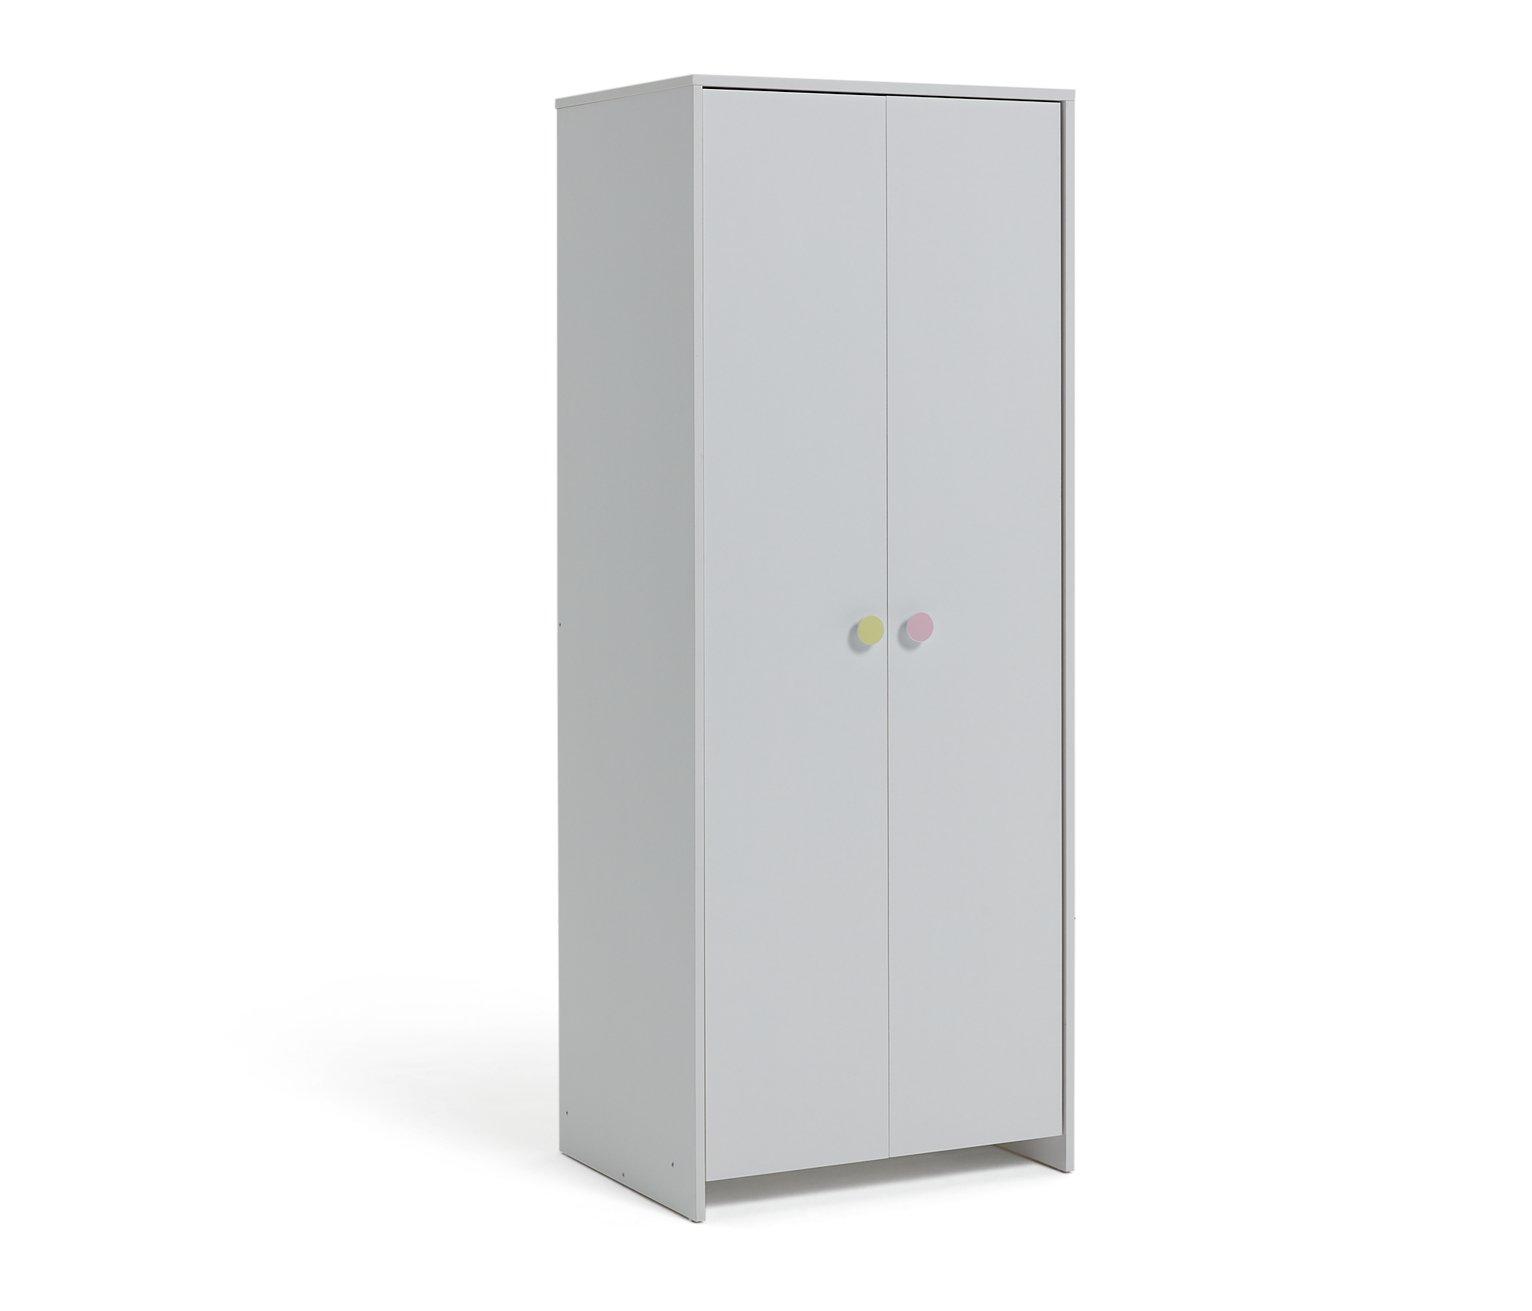 Argos Home Juno 2 Door Wardrobe - White